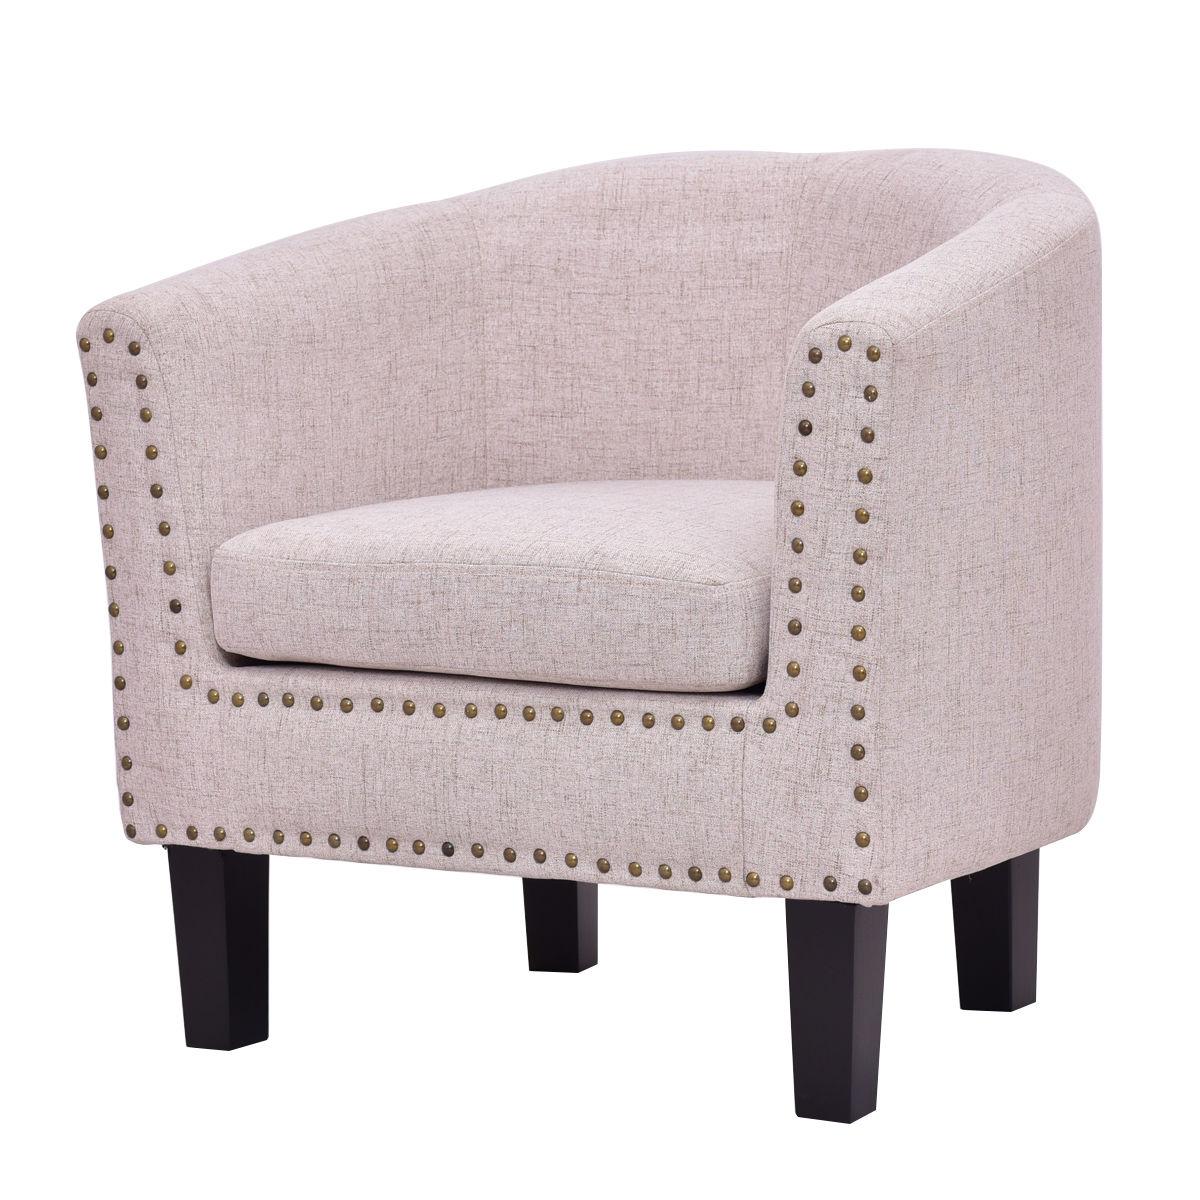 Modern Sofa Chair: Giantex Modern Living Room Armchair Accent Fabric Rivets